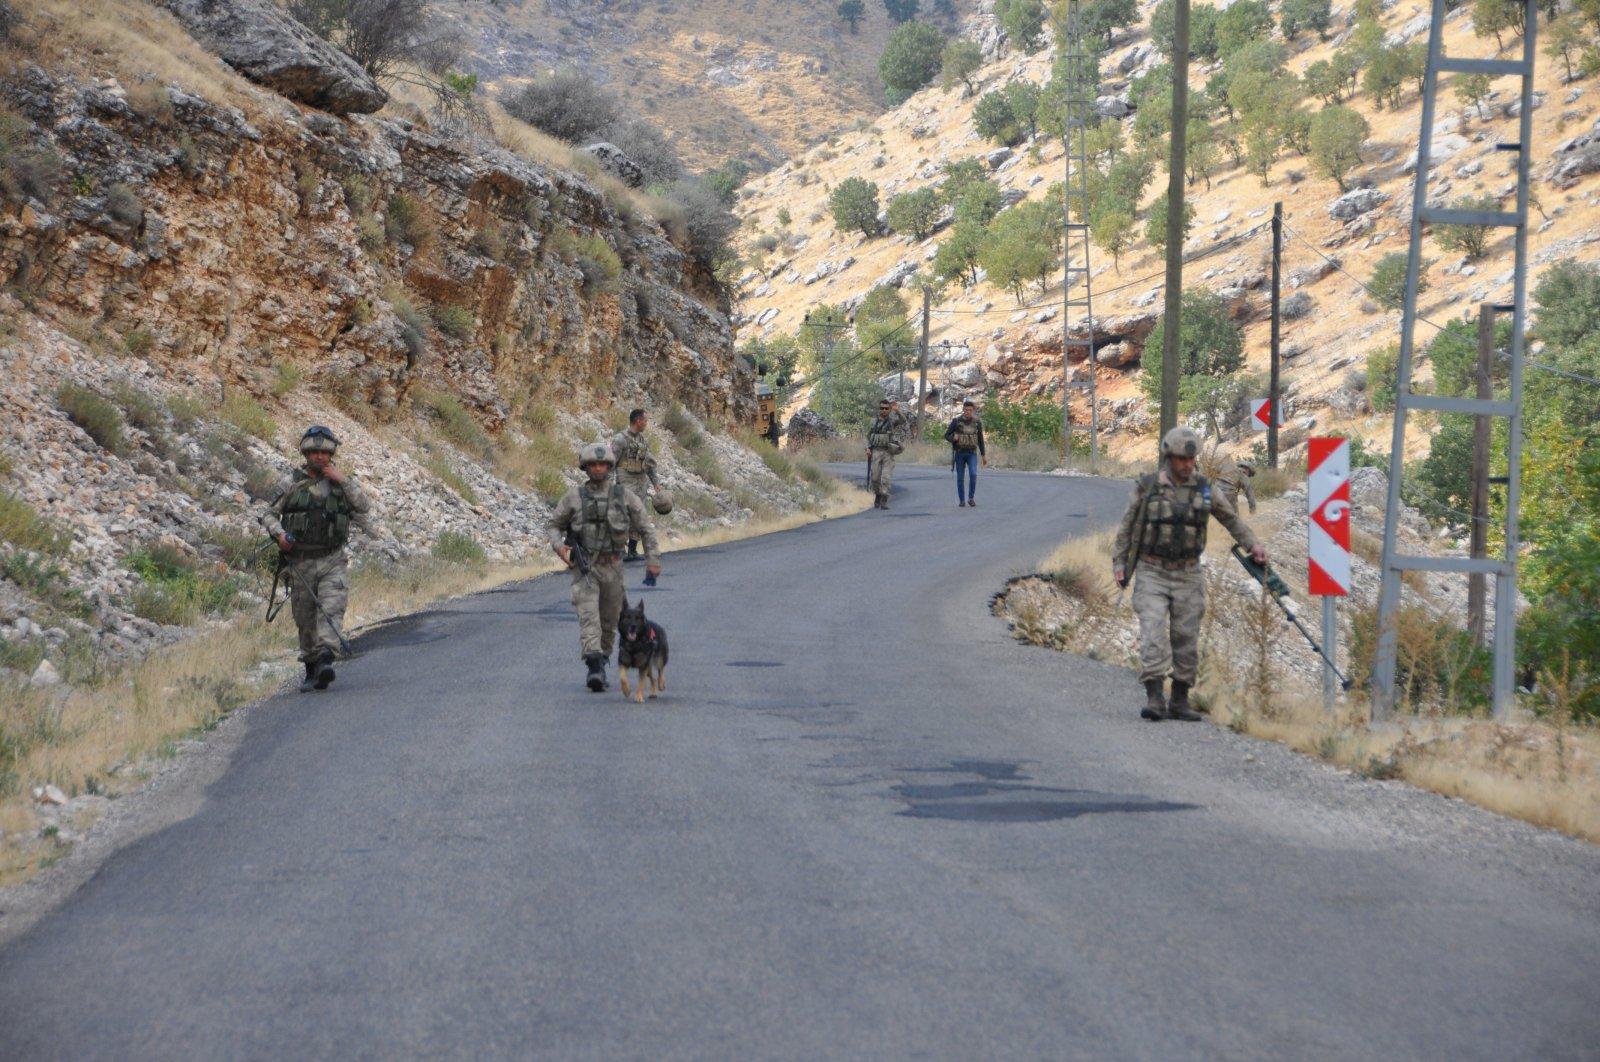 Gendarmerie forces participate in an anti-terror operation in southeastern Adıyaman province, Turkey, Oct. 22, 2019. (AA File Photo)